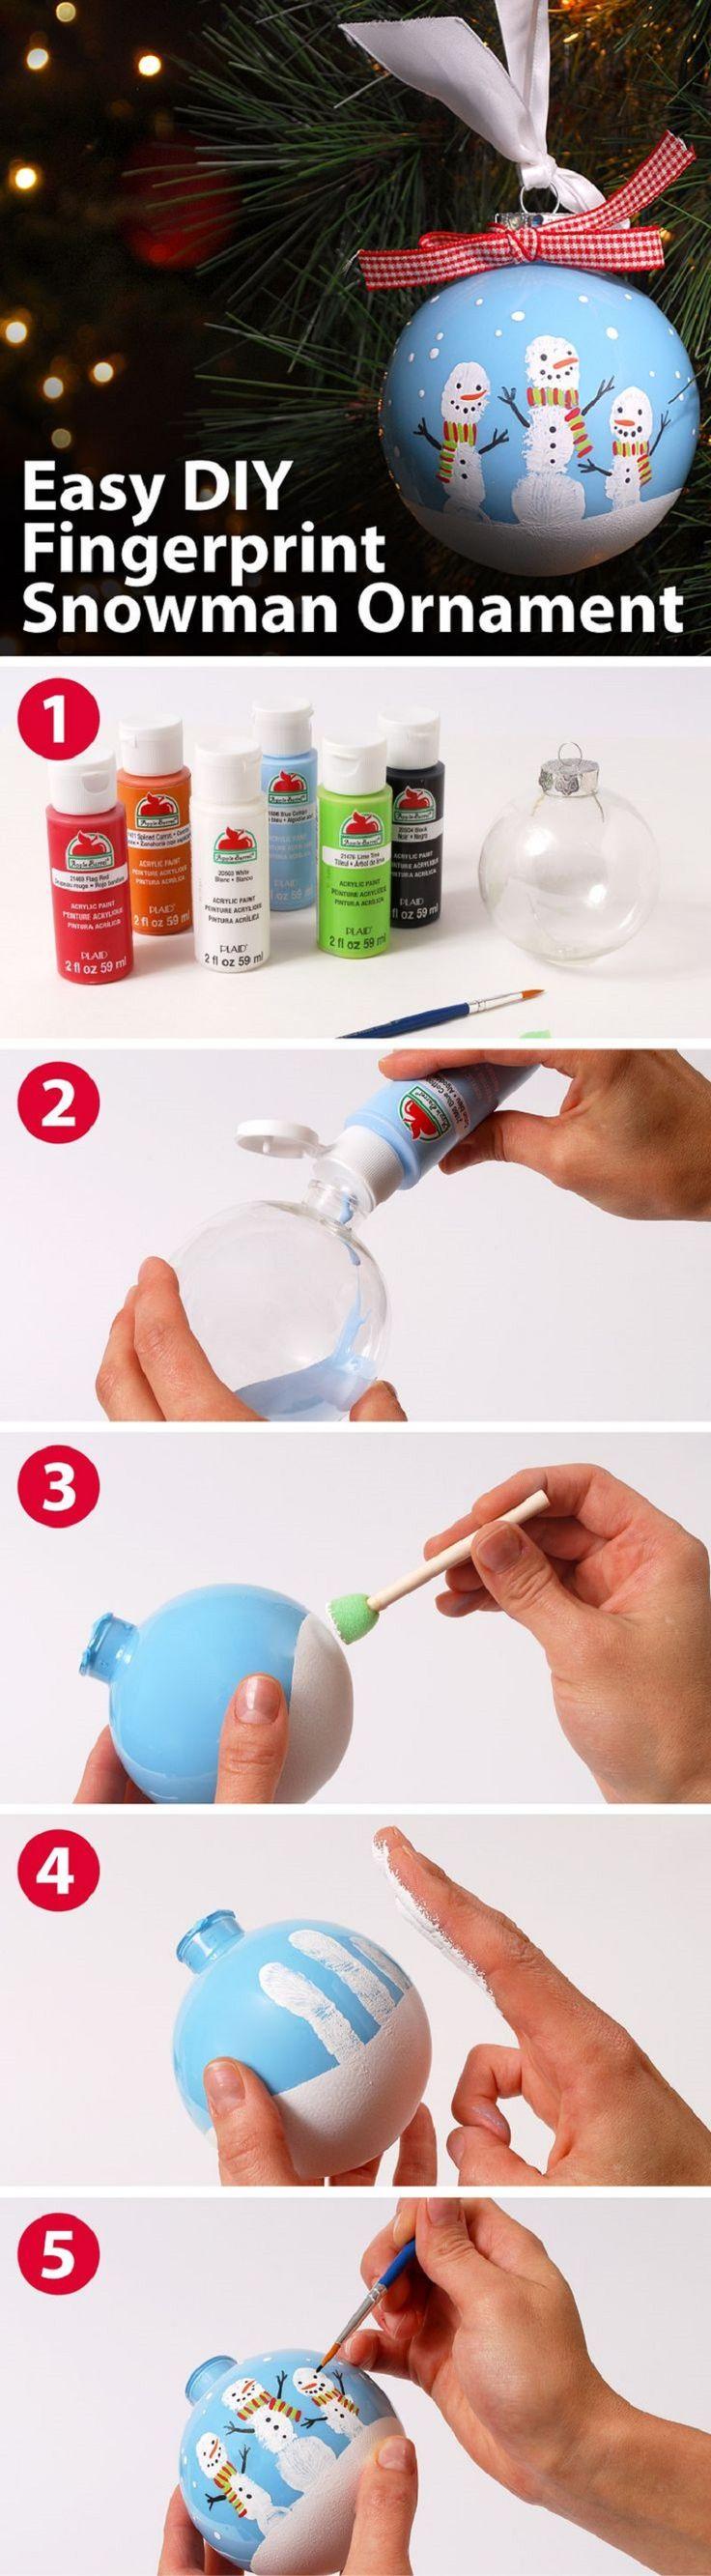 Easy DIY Fingerprint Ornament - 15 Pretty Handmade DIY Christmas Ornaments | GleamItUp